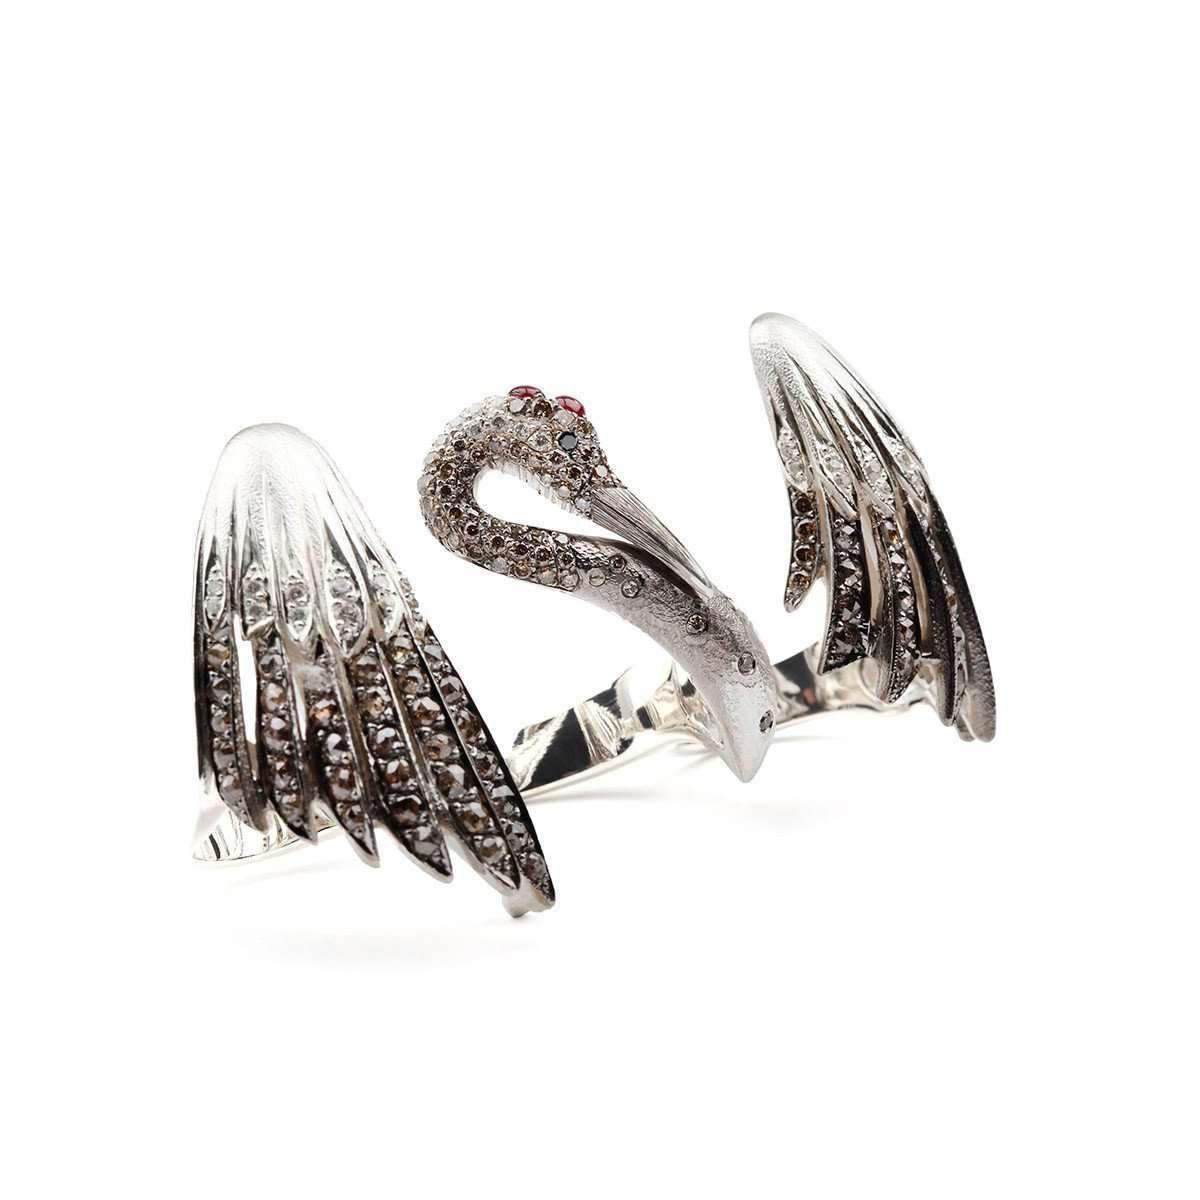 Suciyan Sterling Silver Descending Crane Knuckle Cascade Three Finger Ring in Metallic